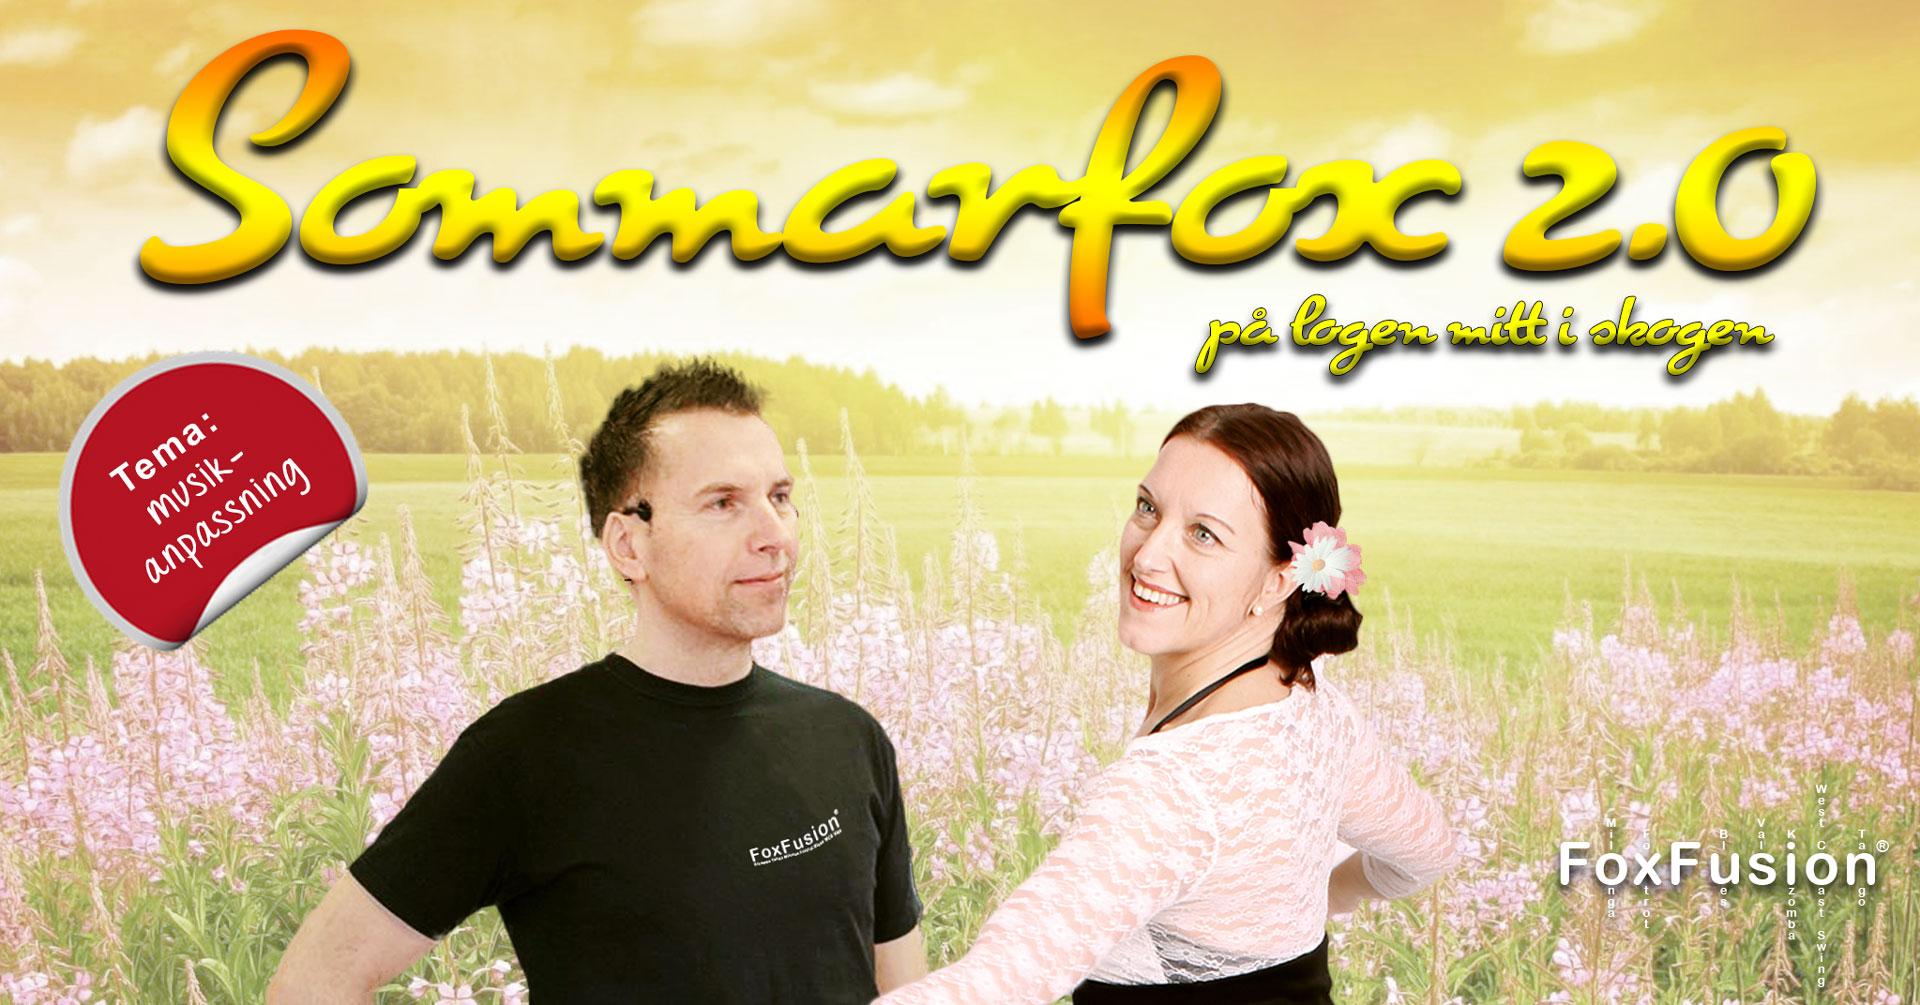 Sommarfox 2.0